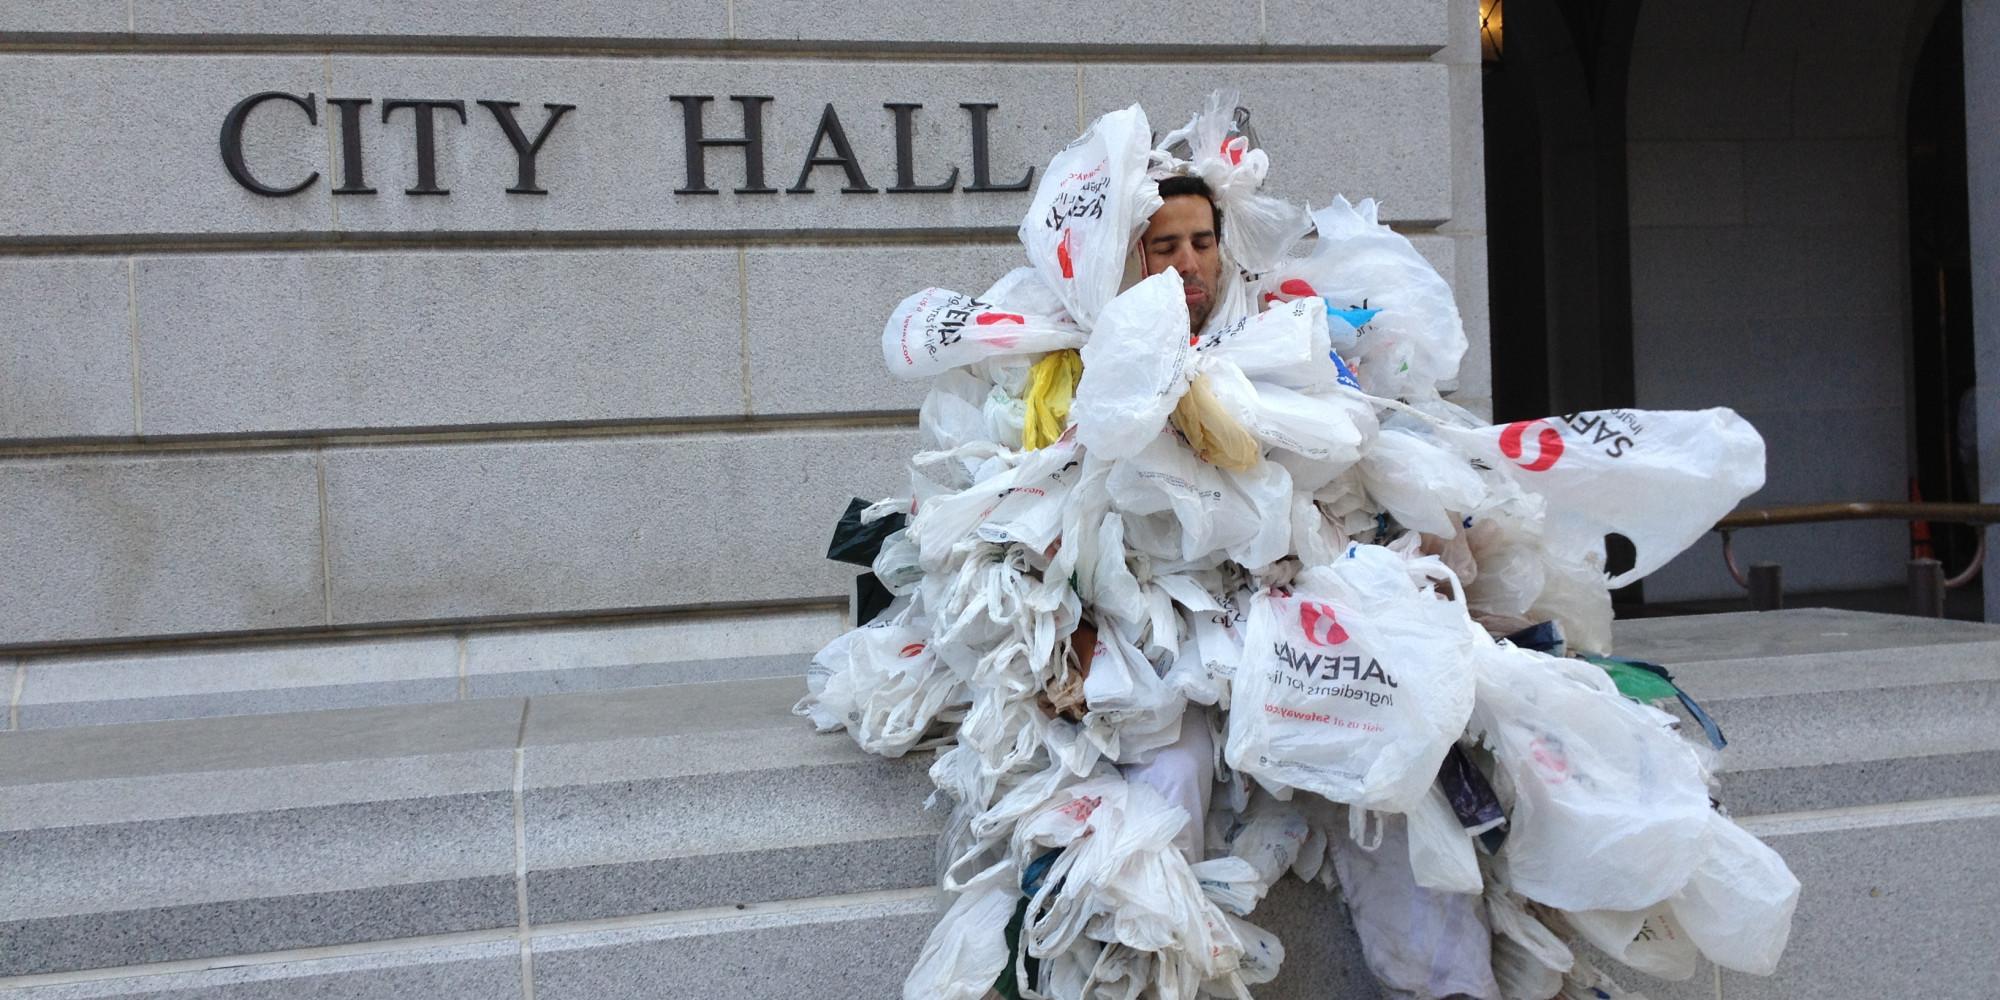 Plastic bag ban chicago - Plastic Bag Ban Chicago 1